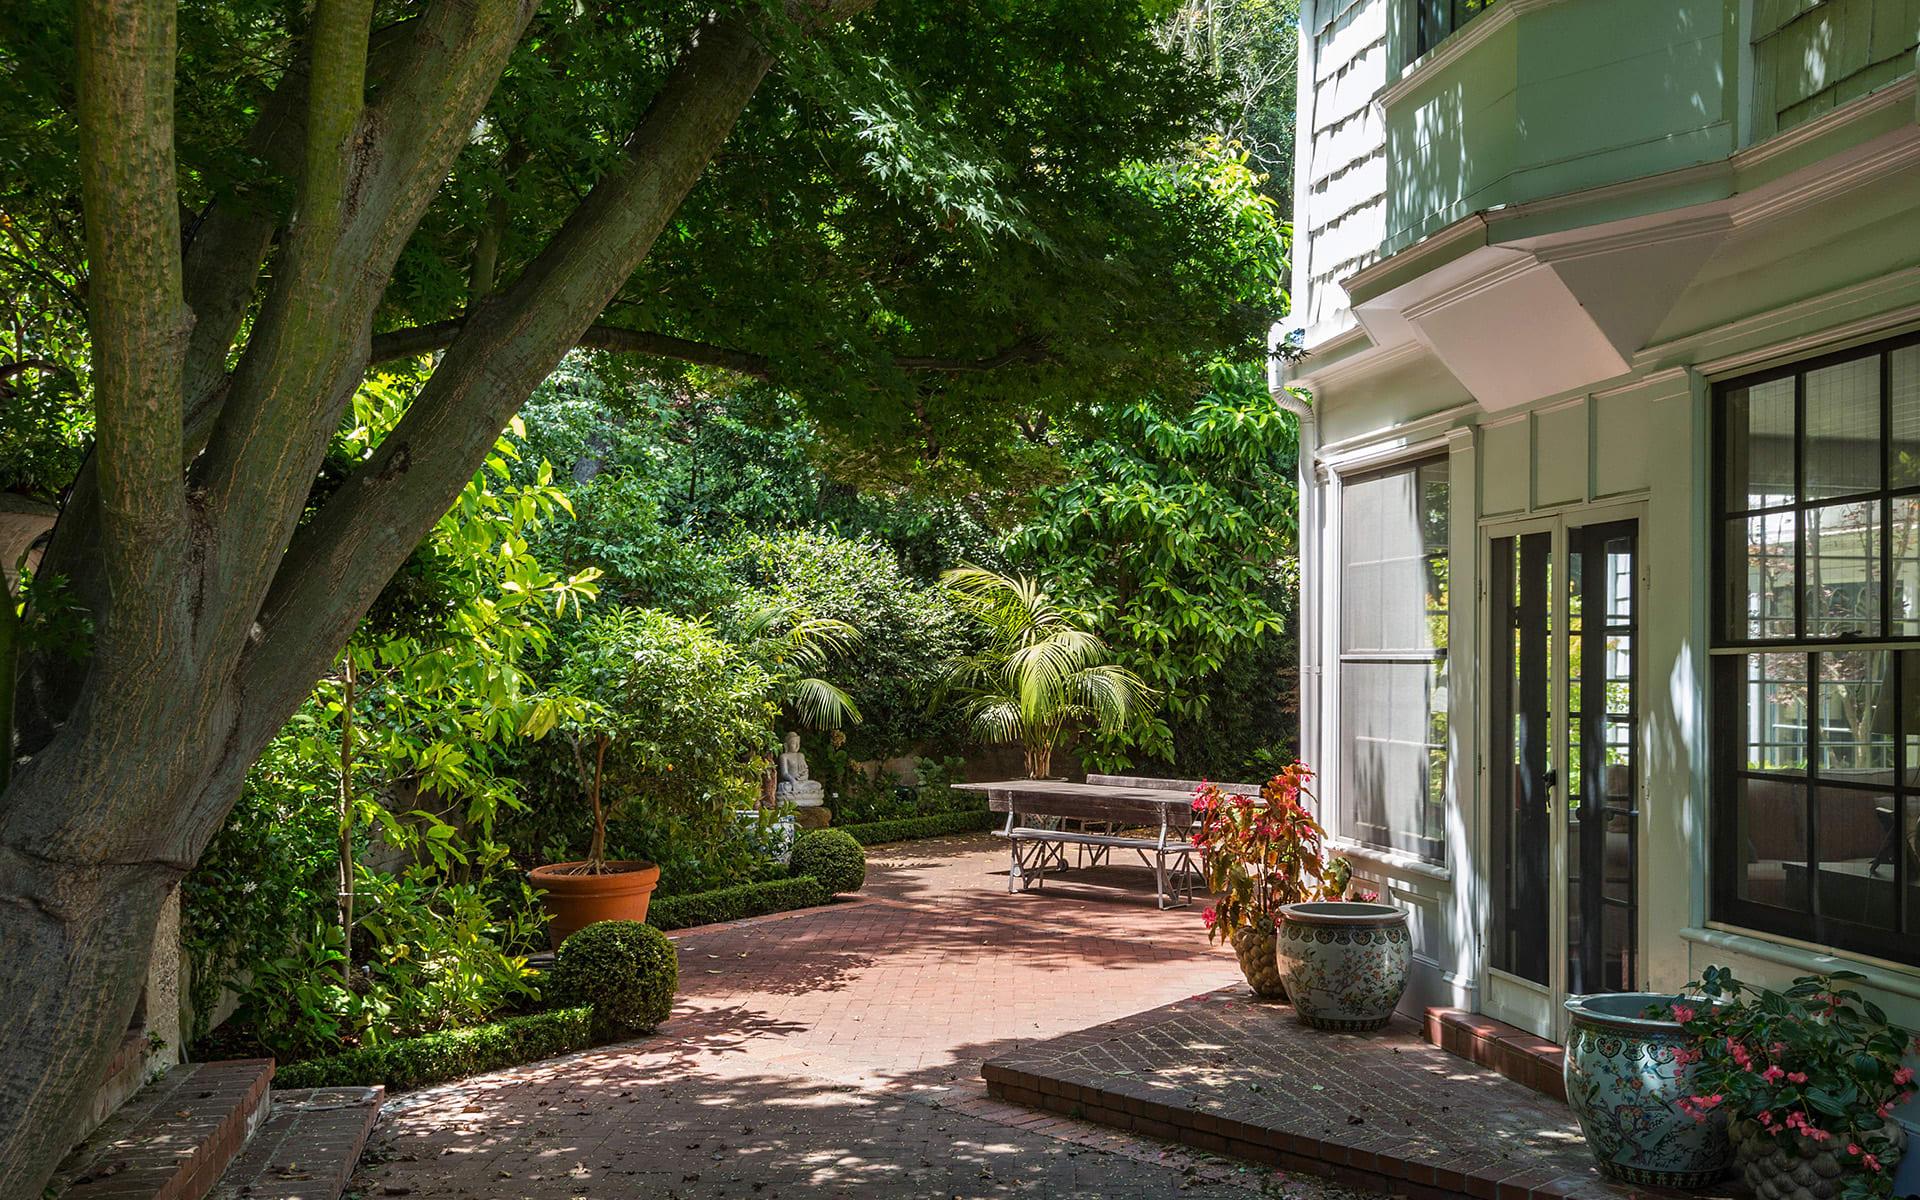 Additional photo for property listing at 9212 Hazen Dr 9212 Hazen Dr 贝弗利山庄, 加利福尼亚州,90210 美国